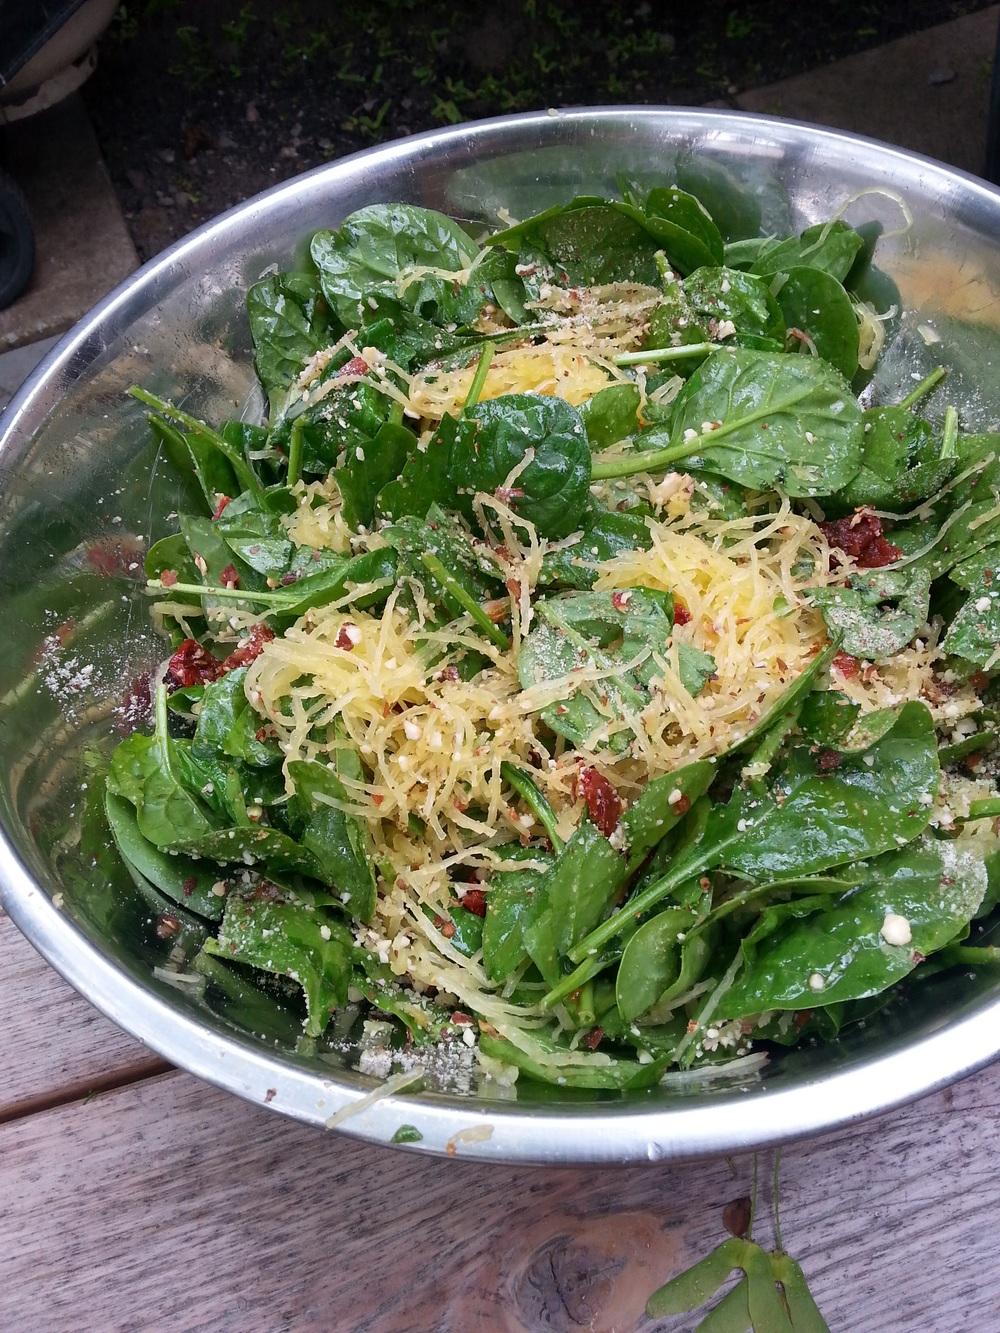 Hot sauce spaghetti (squash) spinach salad